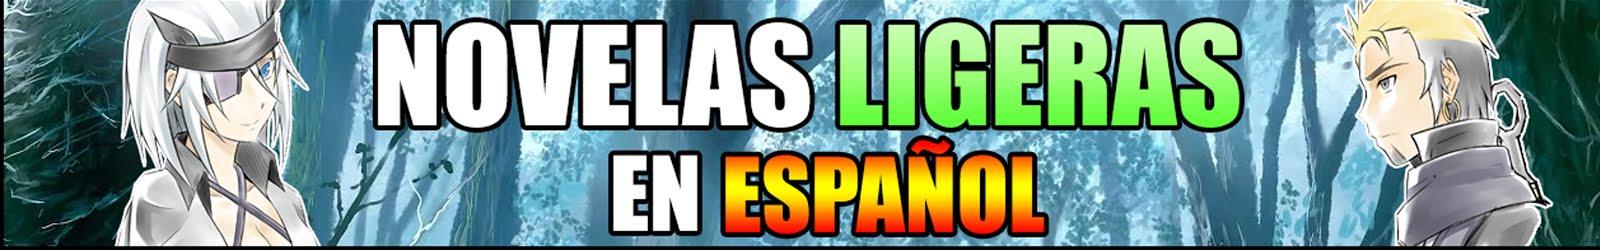 Novelas Ligeras en Español